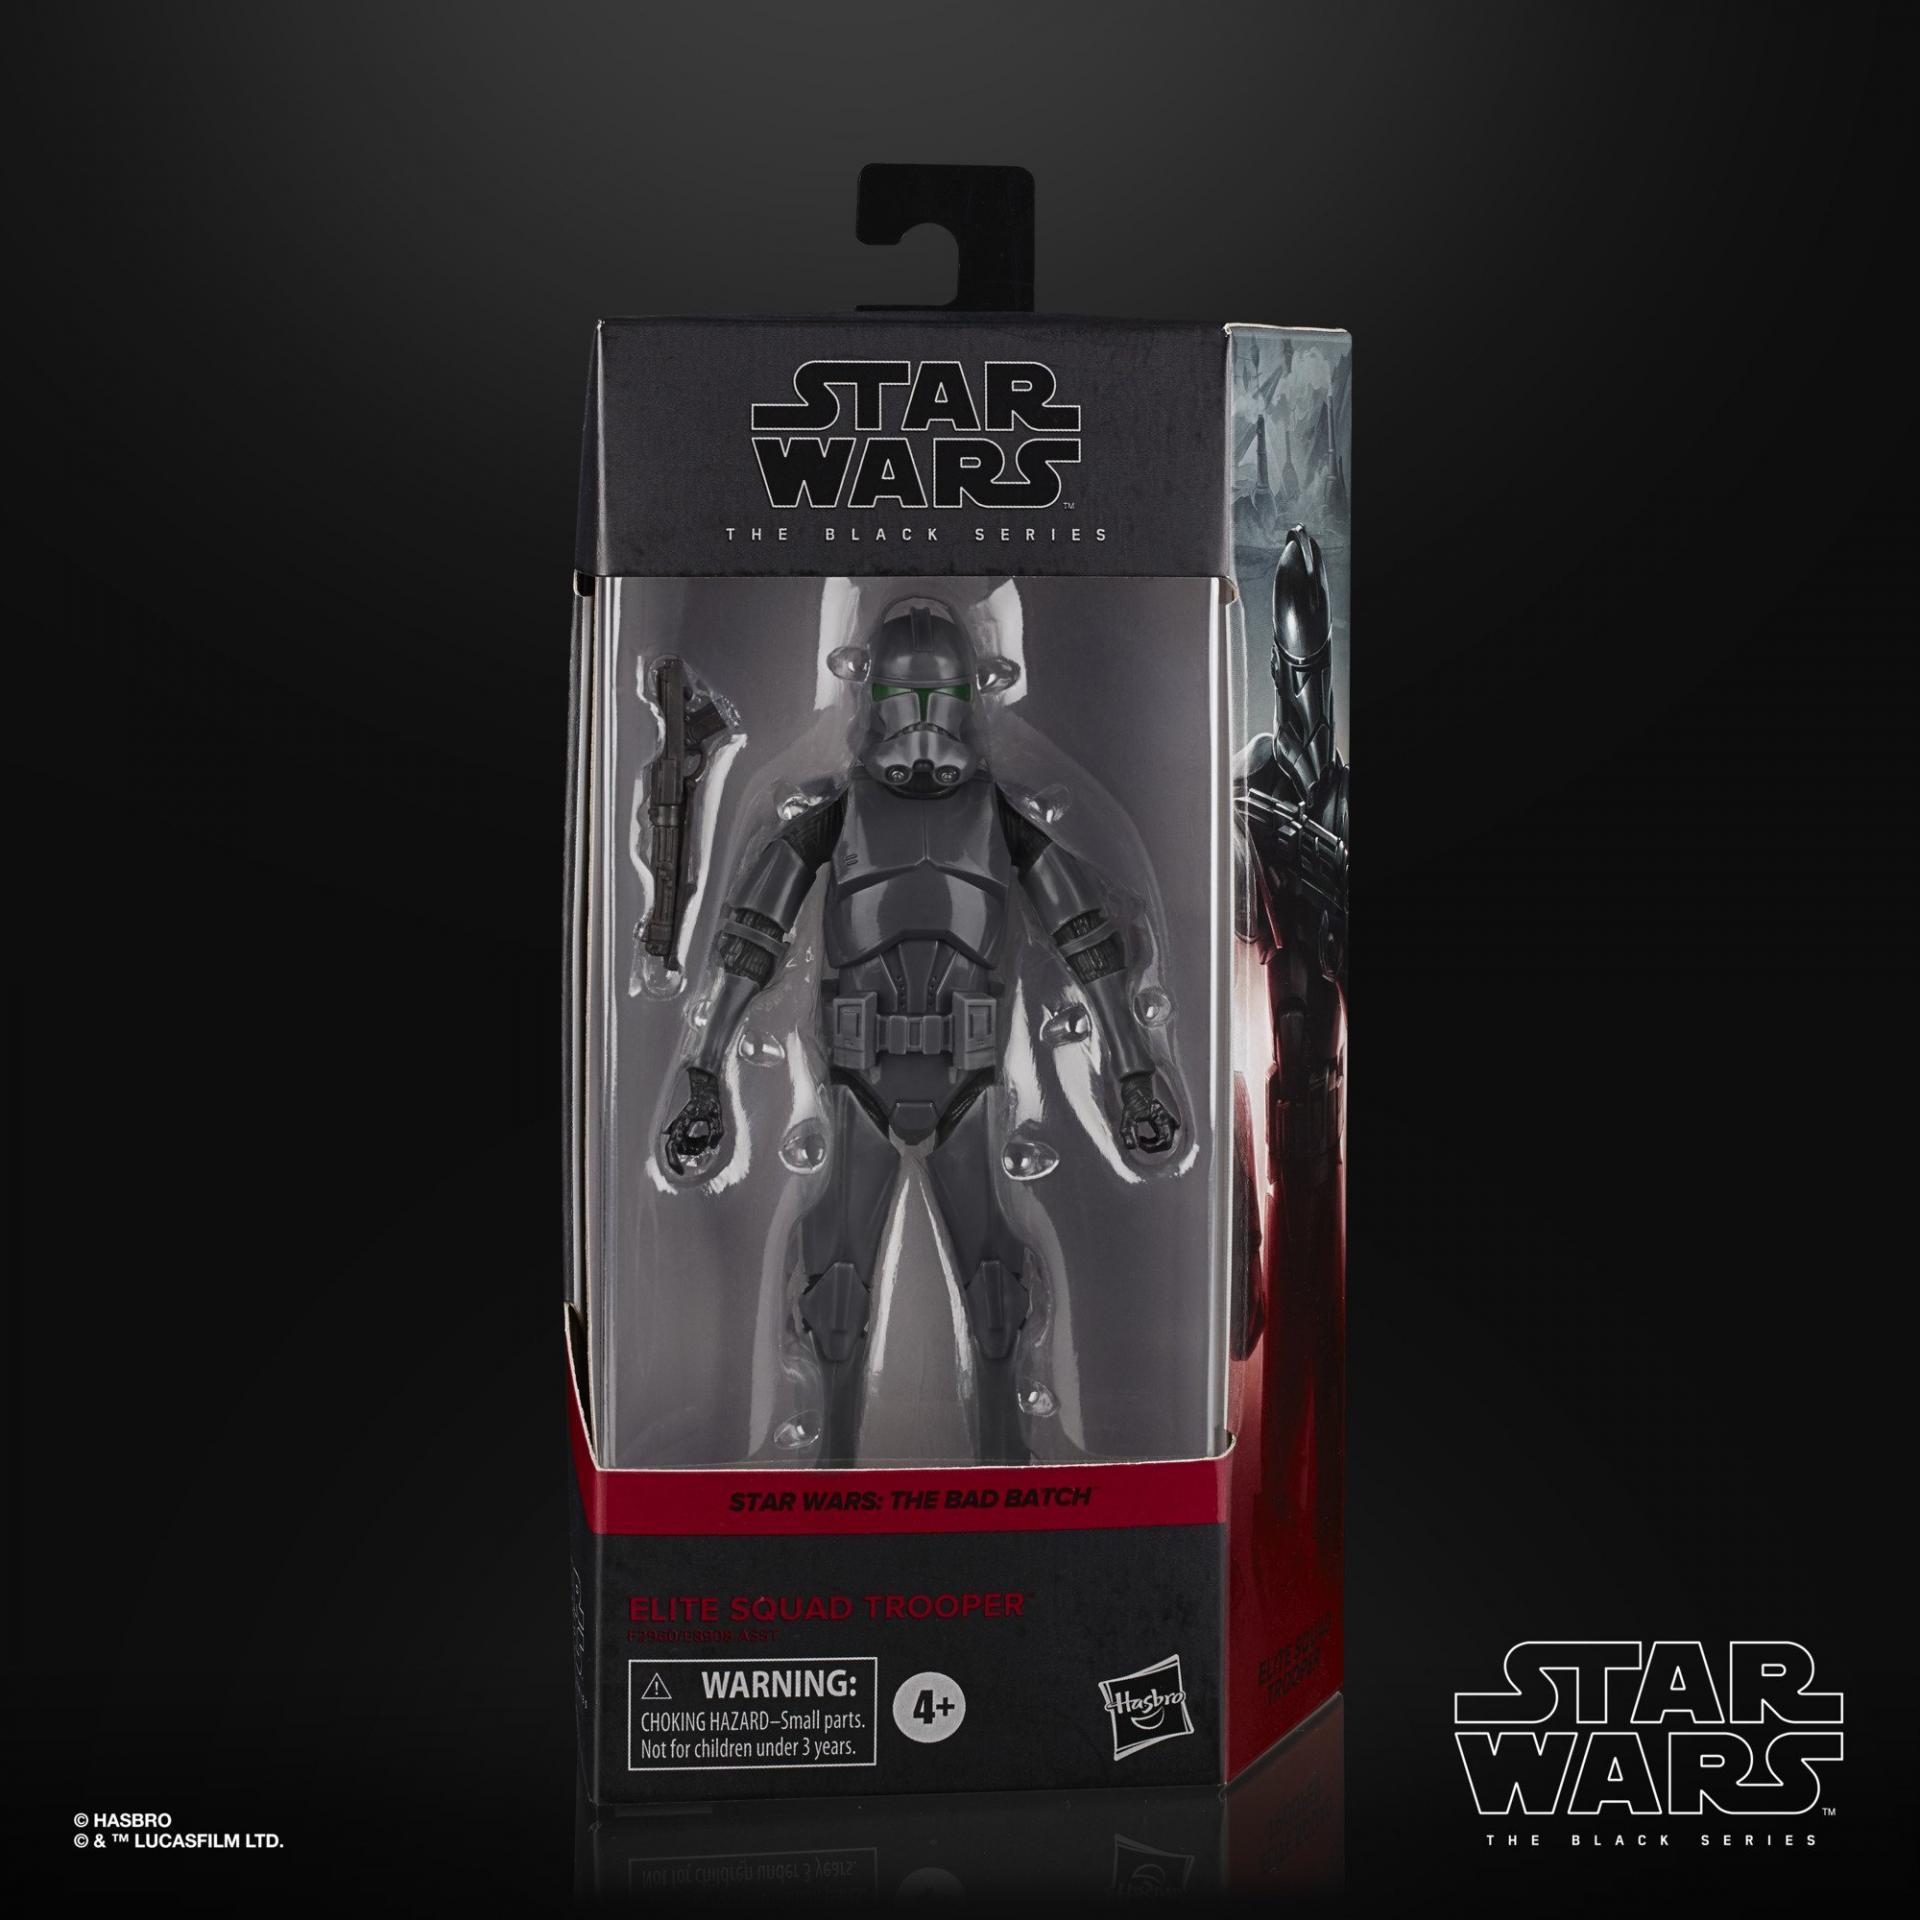 Star wars the black series elite squad trooper 15cm